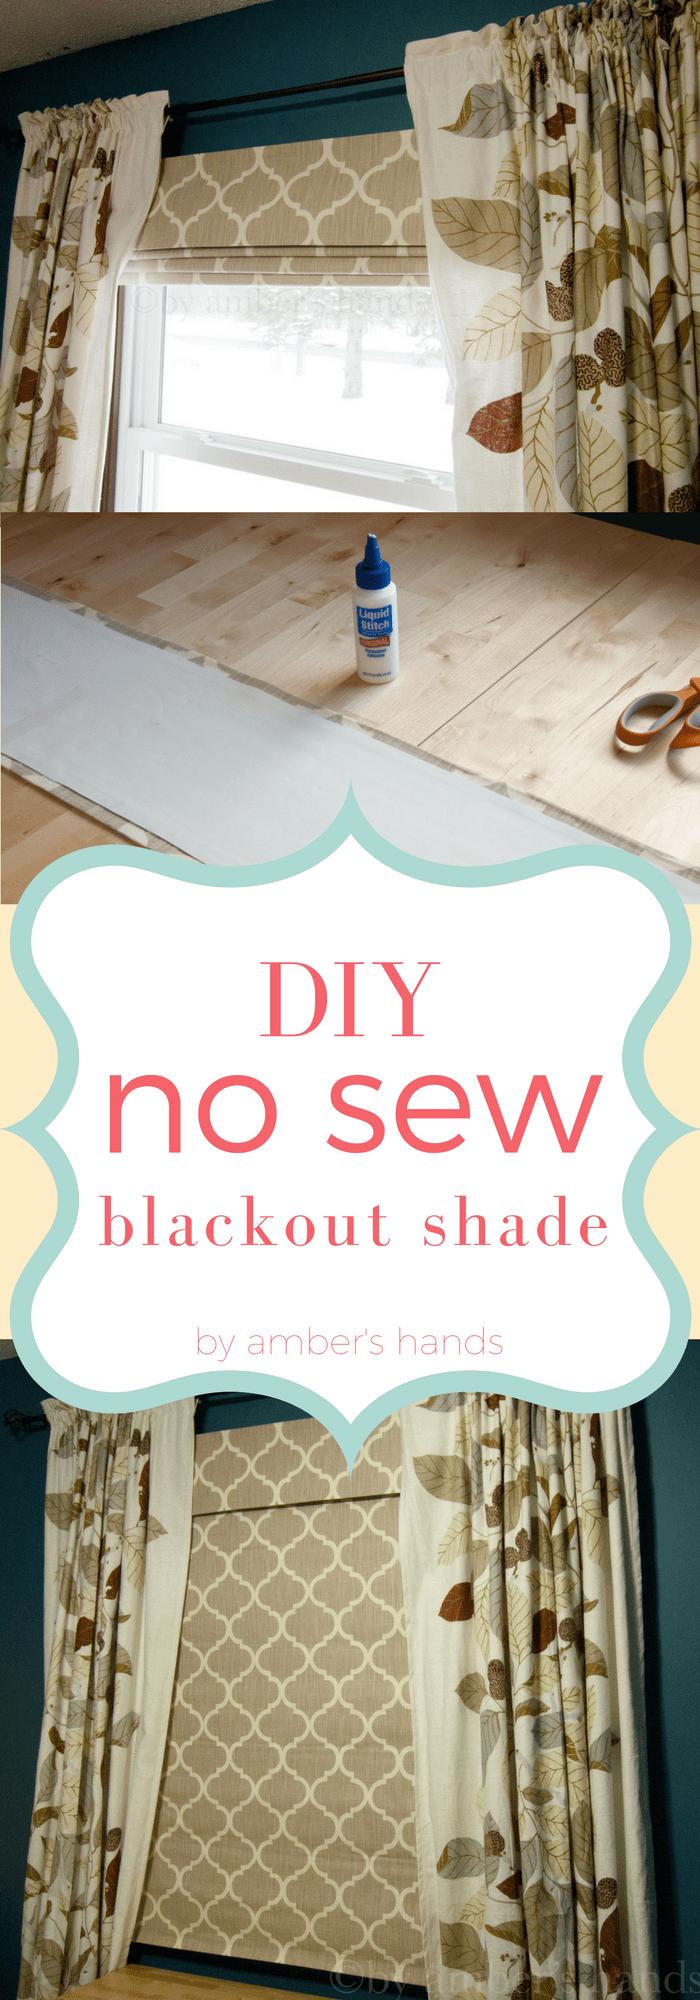 No Sew DIY Blackout Shade | Blackout shades, Diy window ...